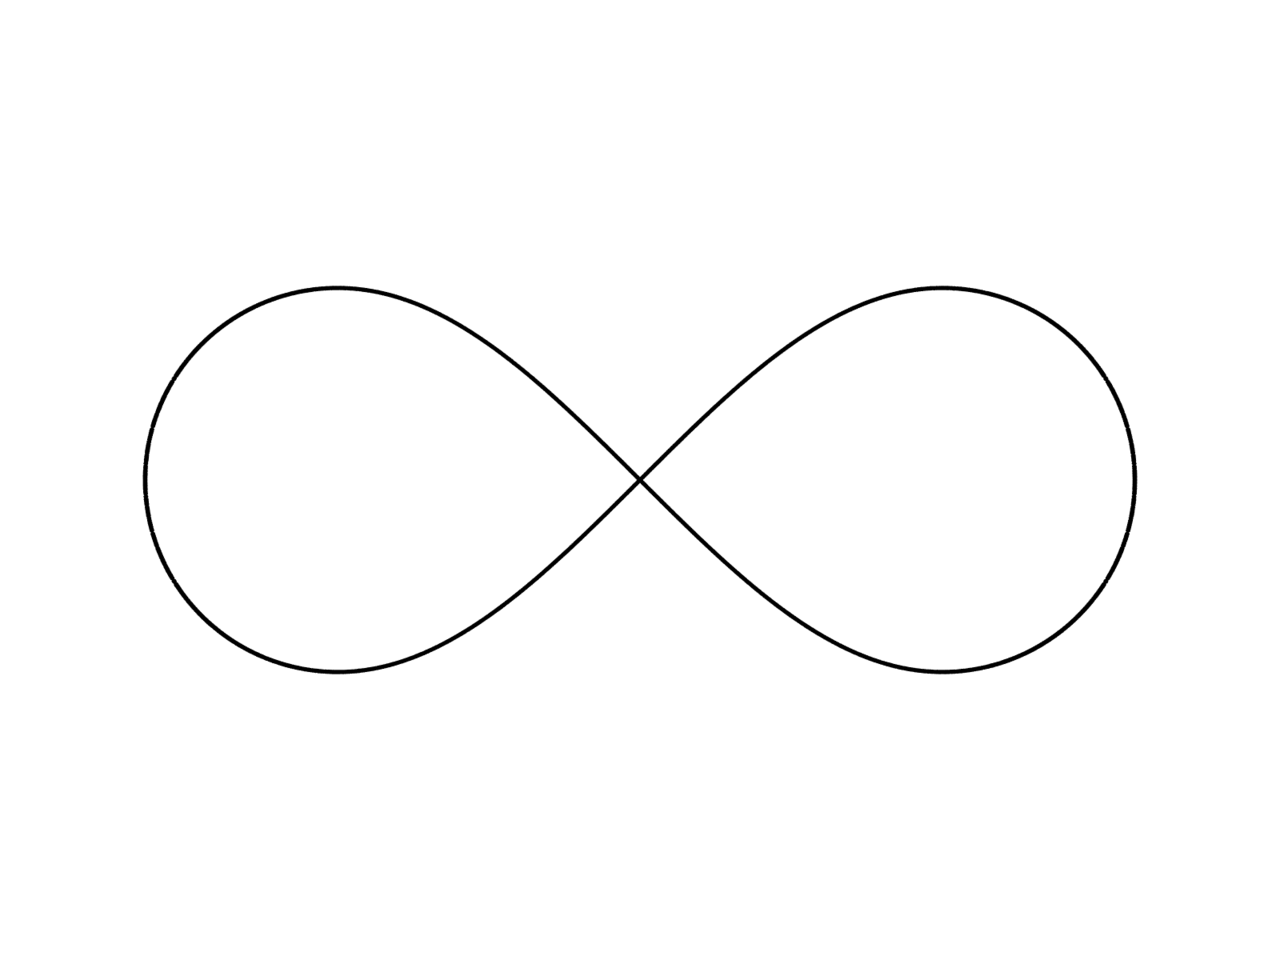 Free Infinity Symbol, Download Free Clip Art, Free Clip Art.